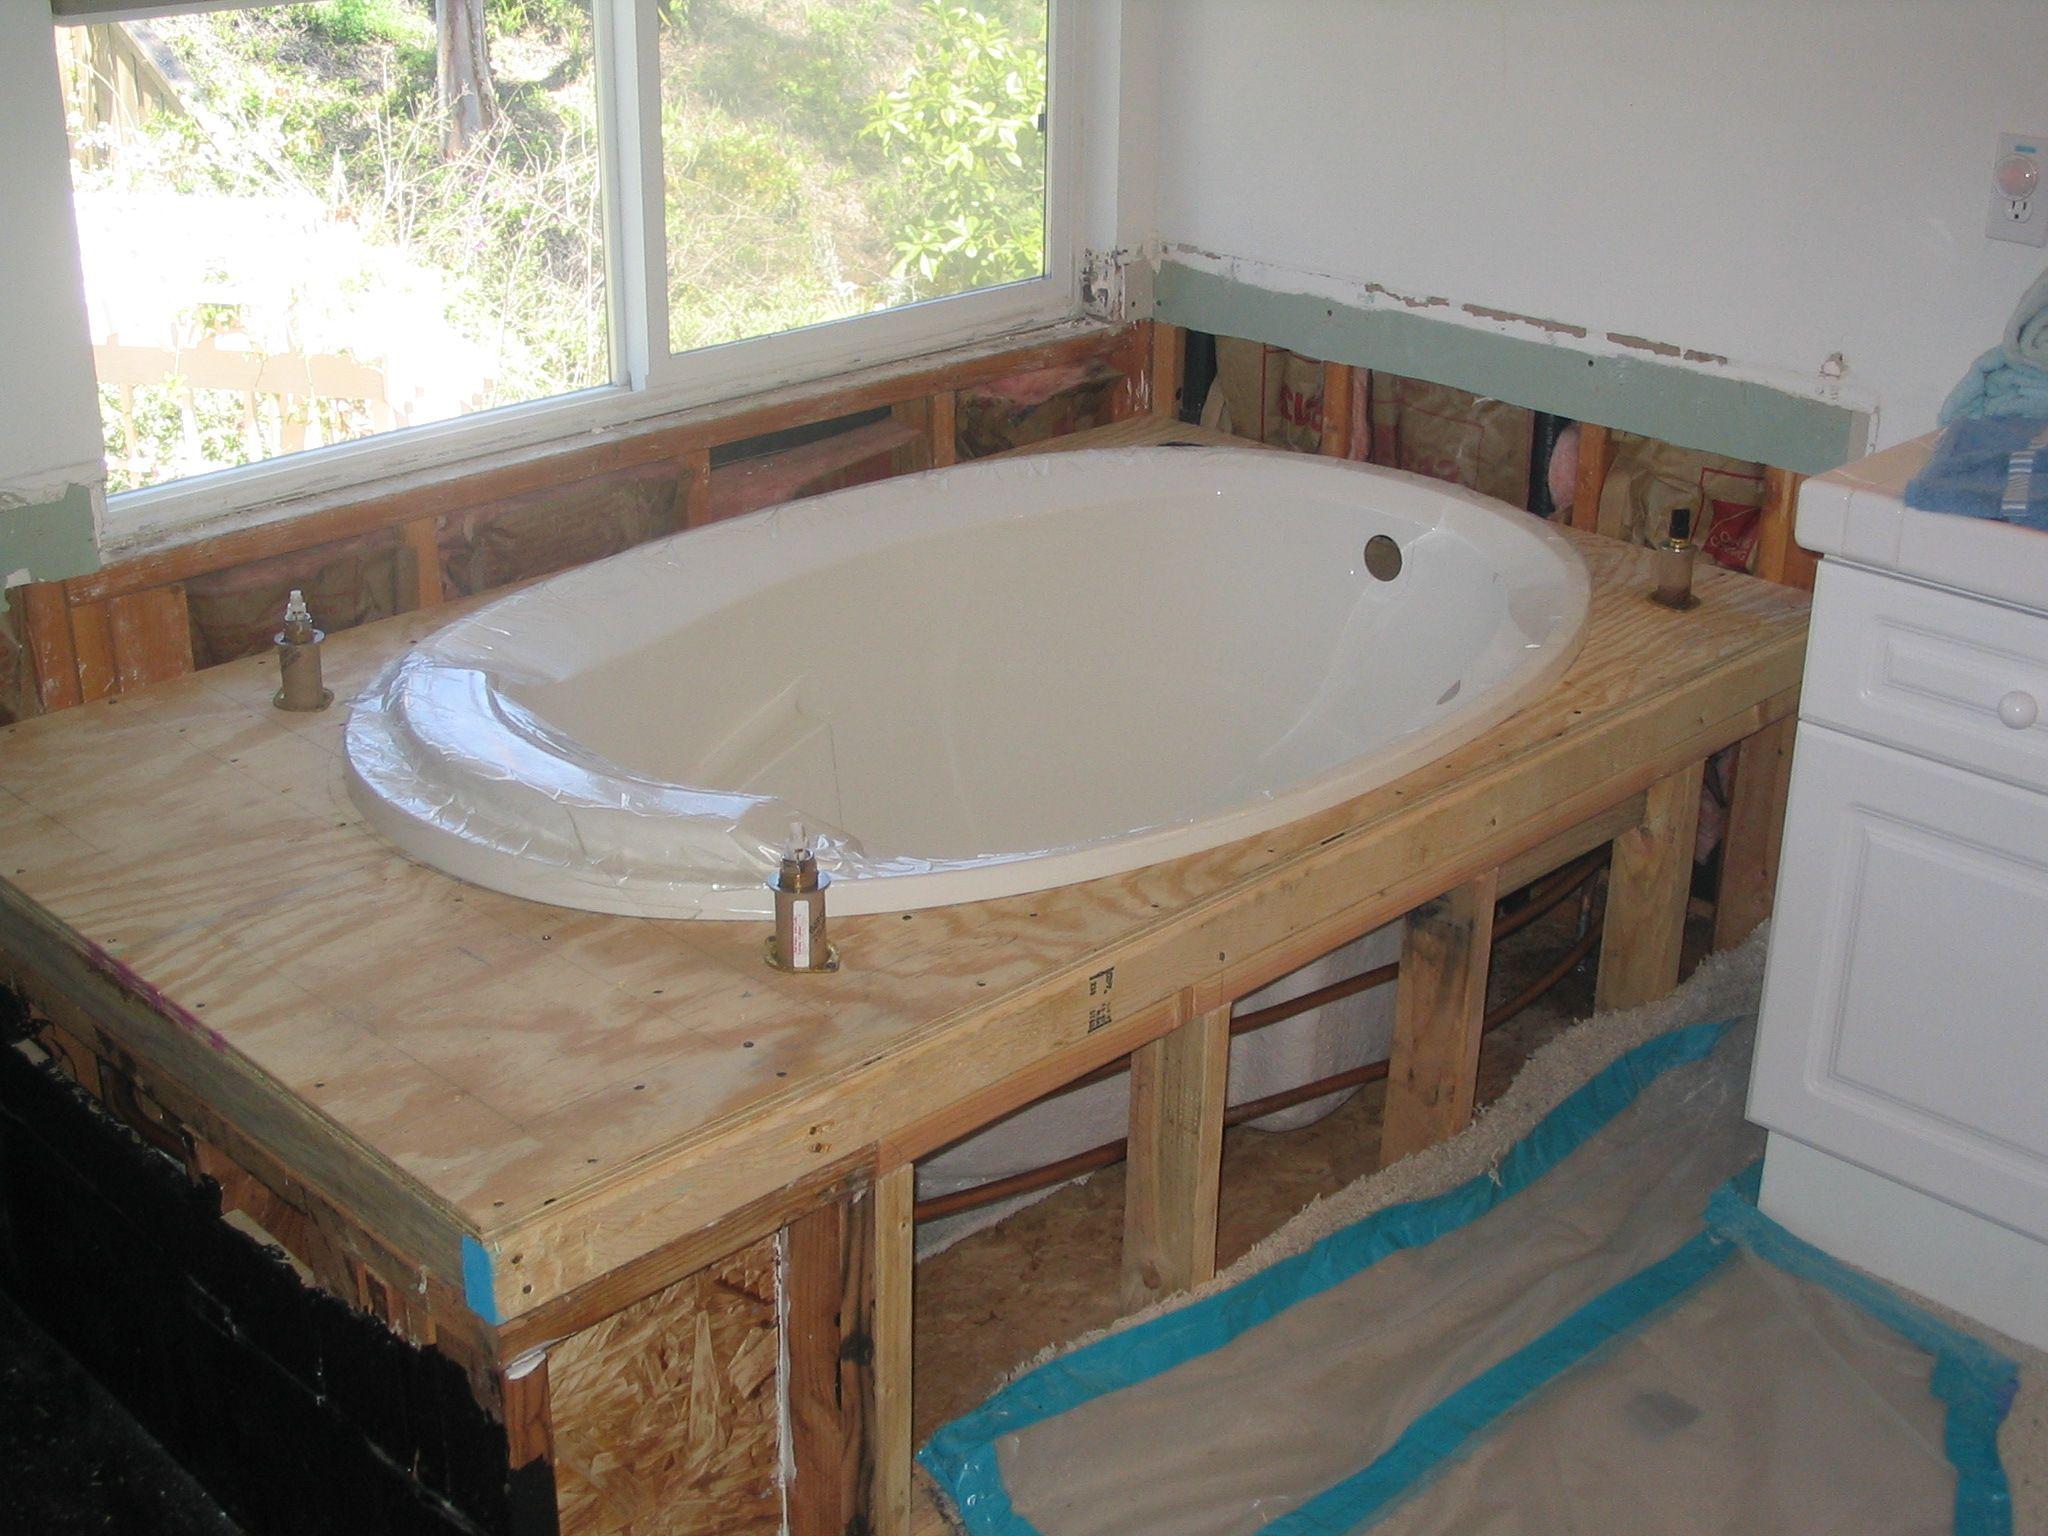 Fitting a Bath  How to Install a New Bathtub  Installation Repairs  Tips  Bathtub Master